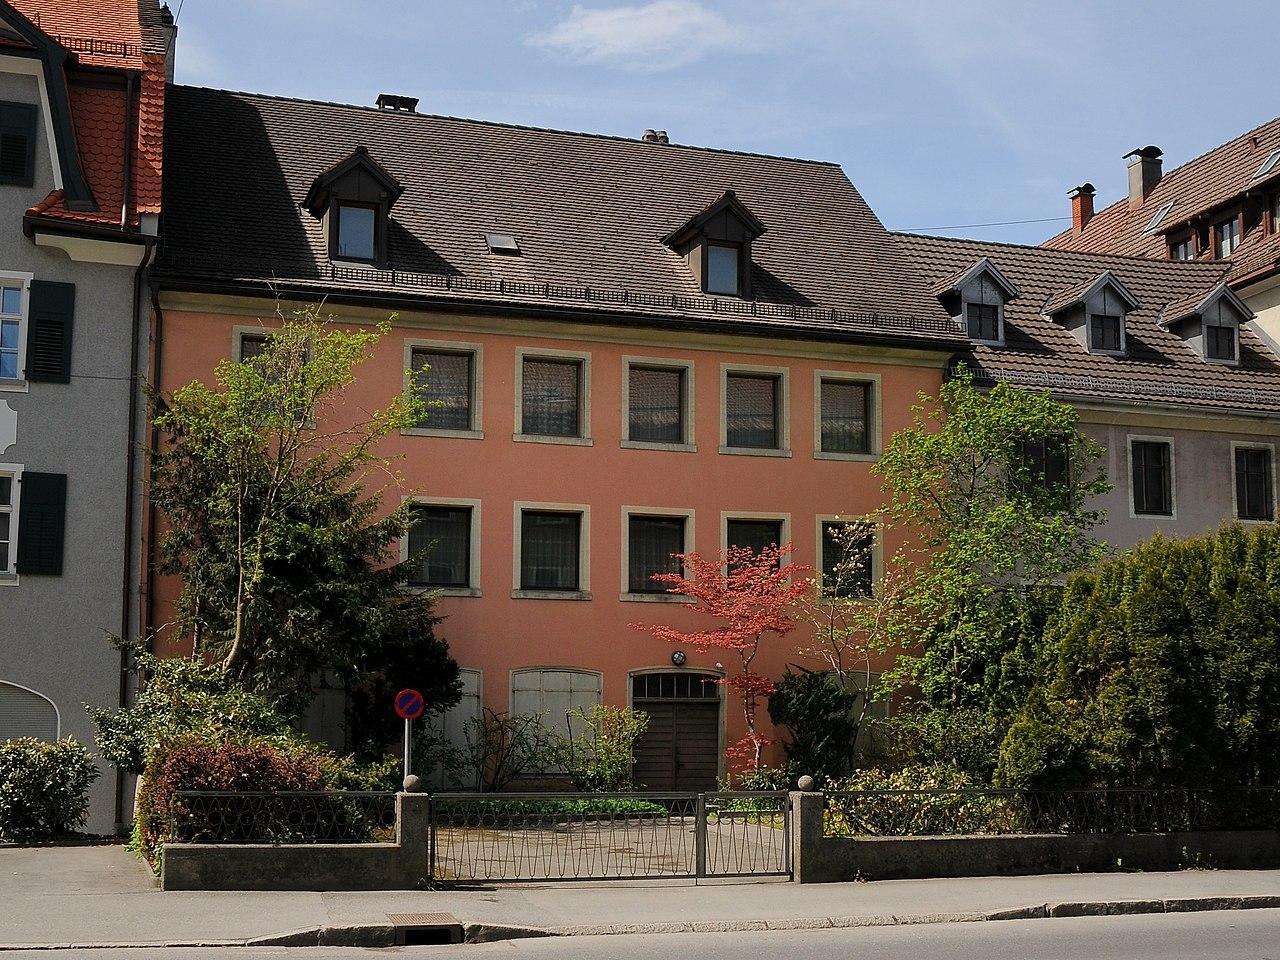 Feldkirch dating